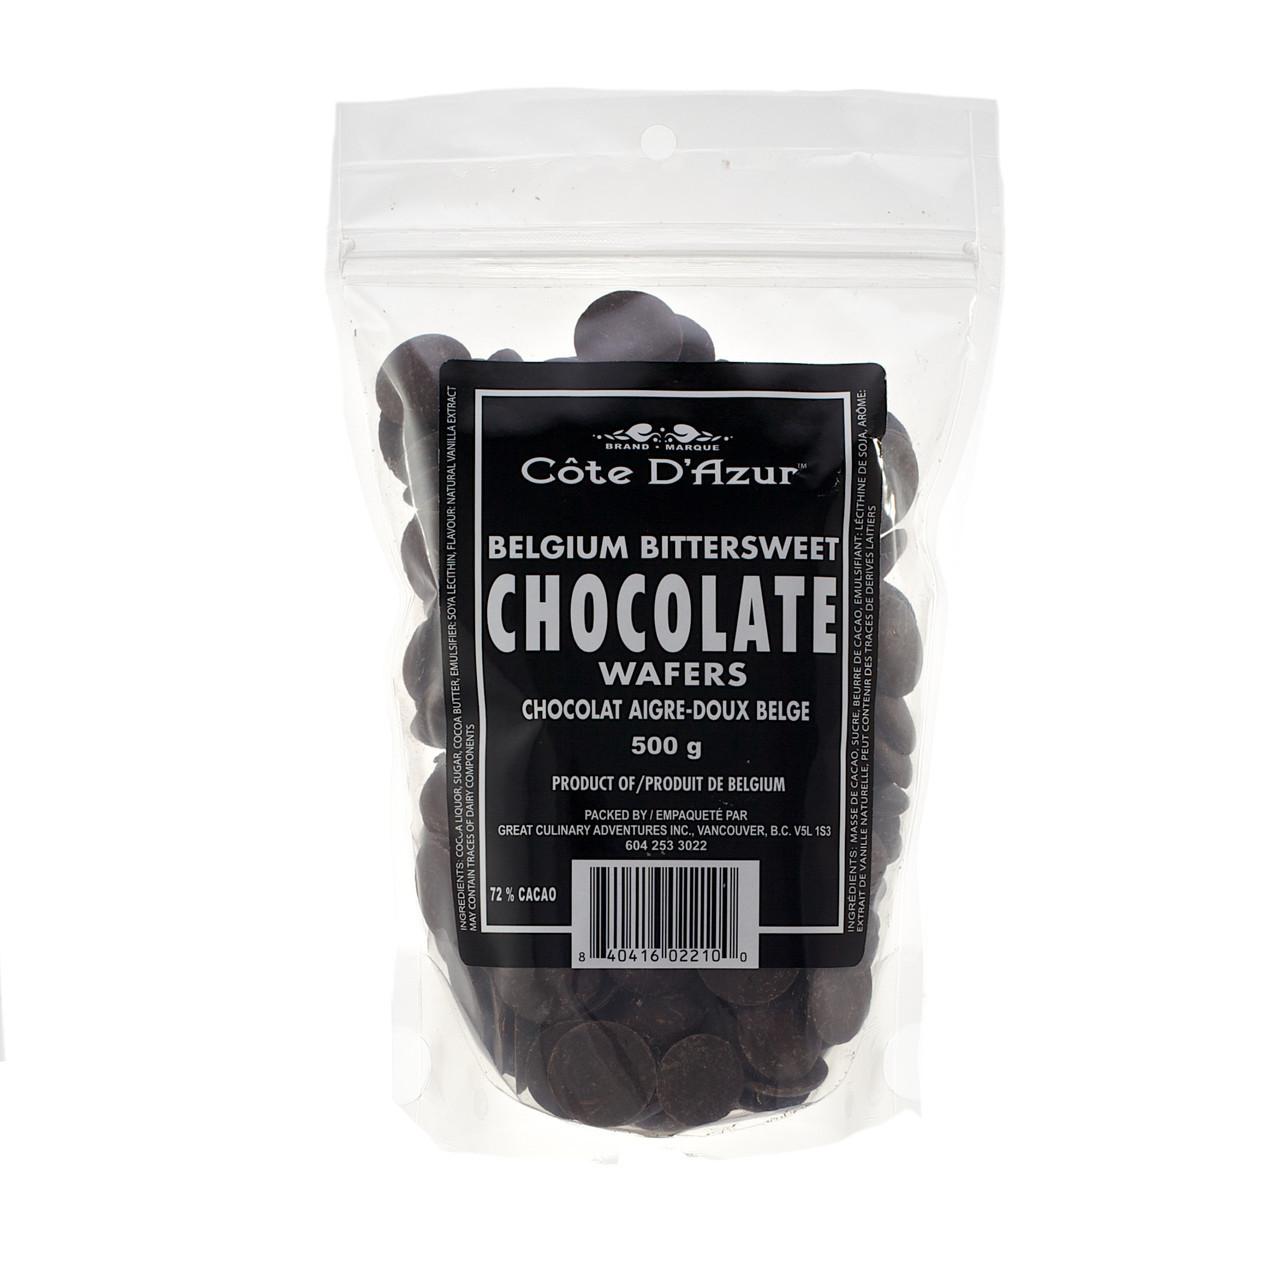 Belgian Bittersweet Chocolate Wafers, 500g